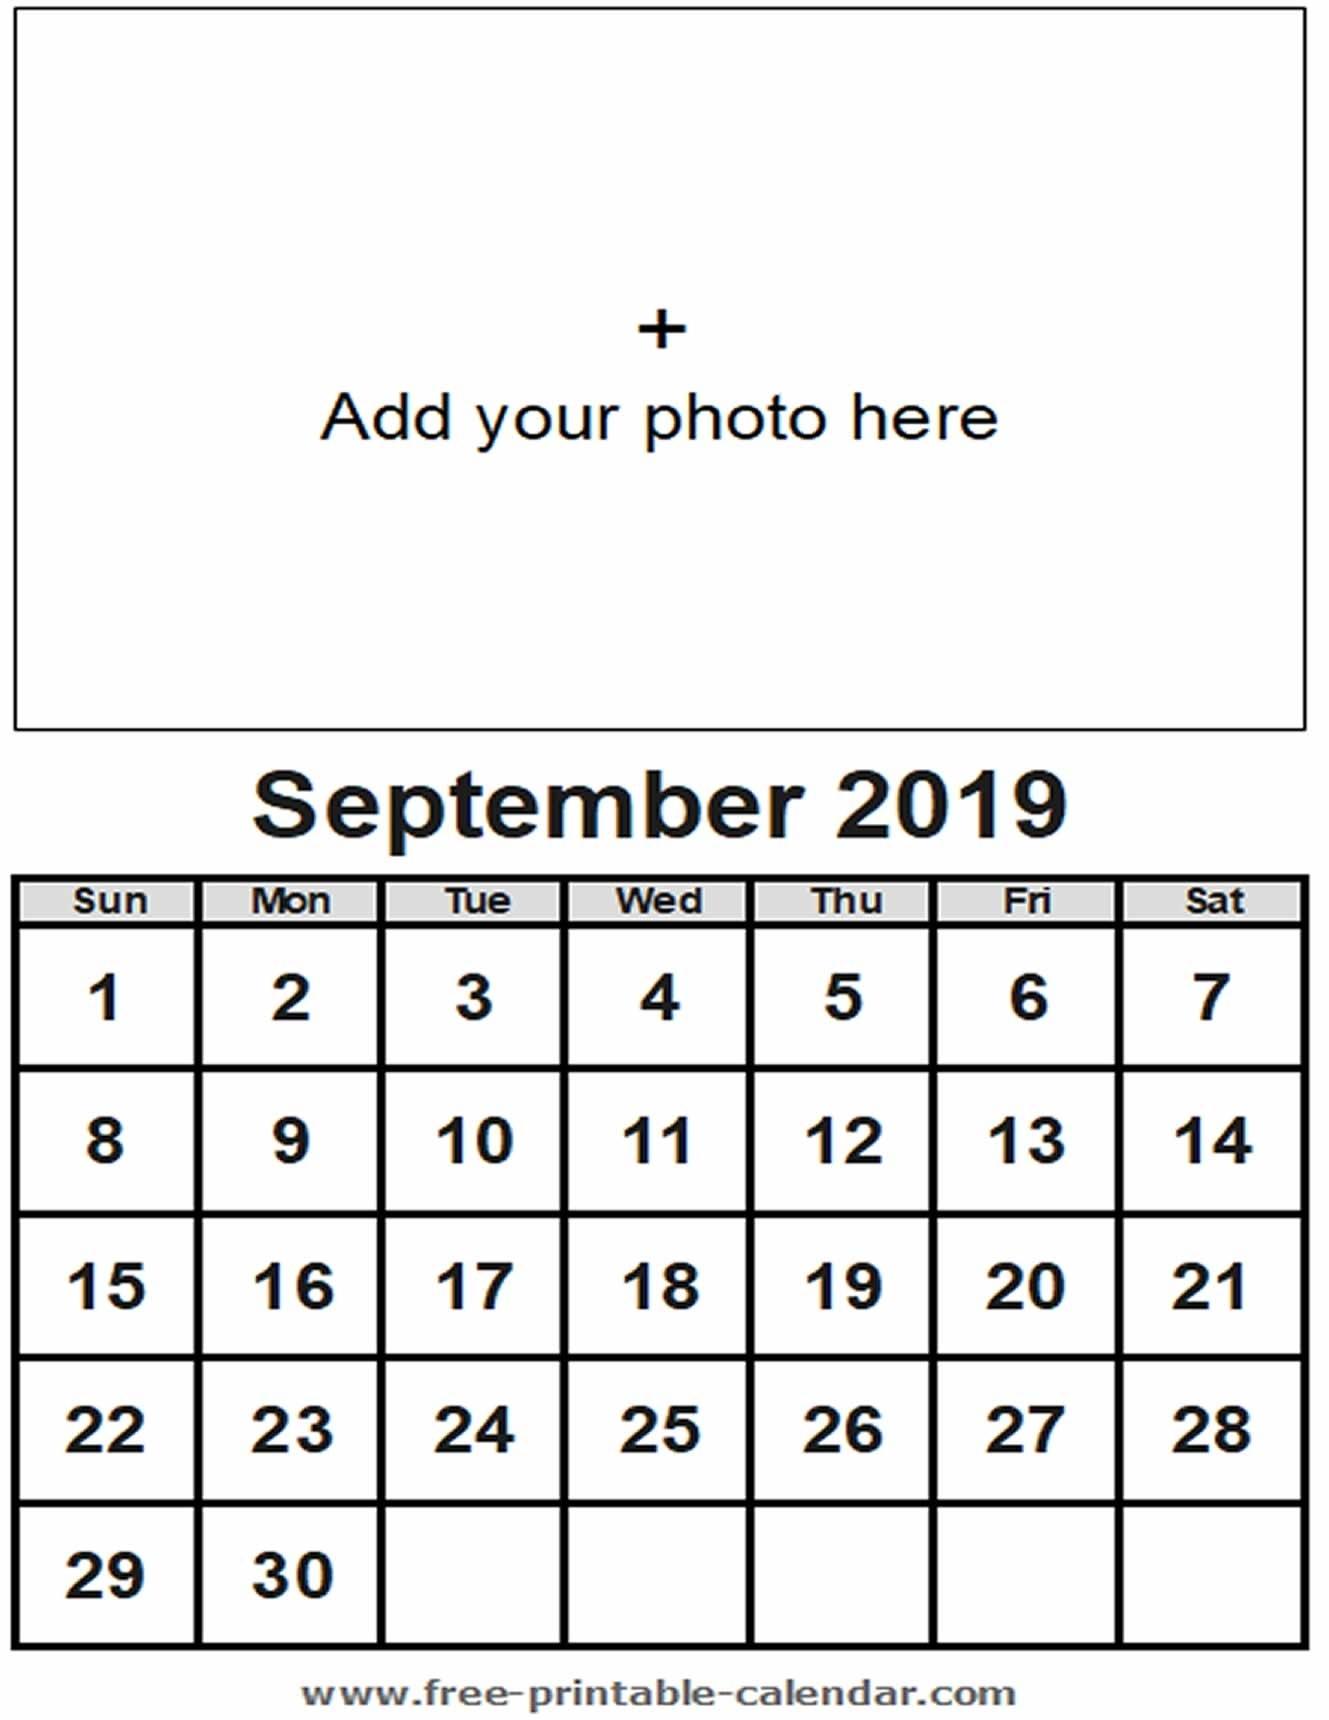 September Calendar 2019 - Free-Printable-Calendar